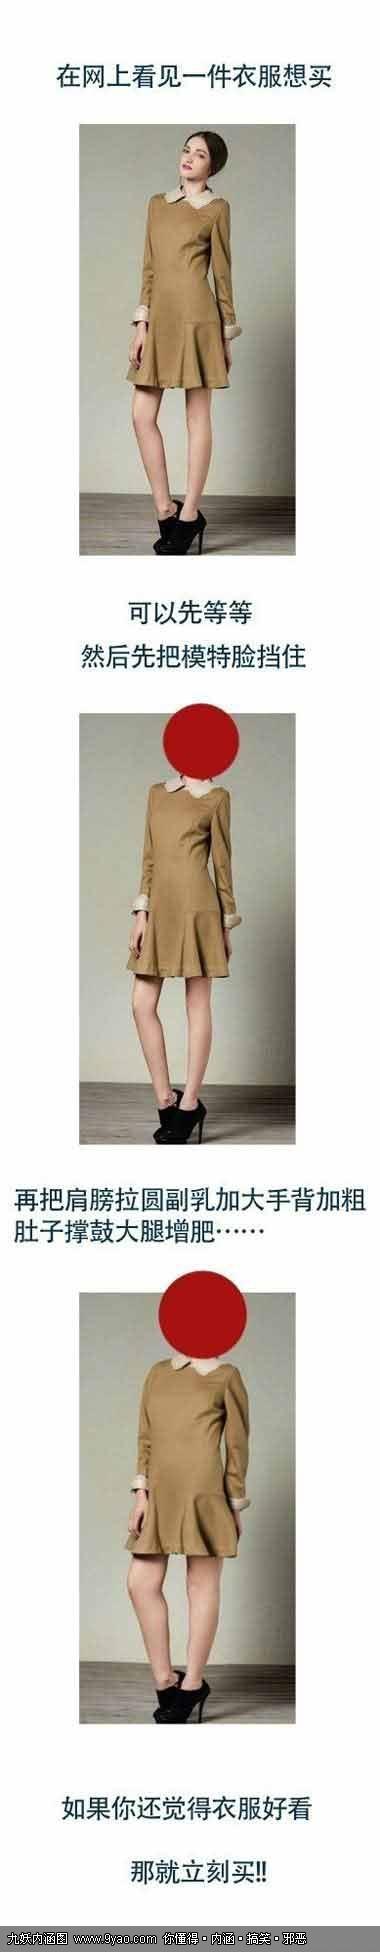 buy_dress